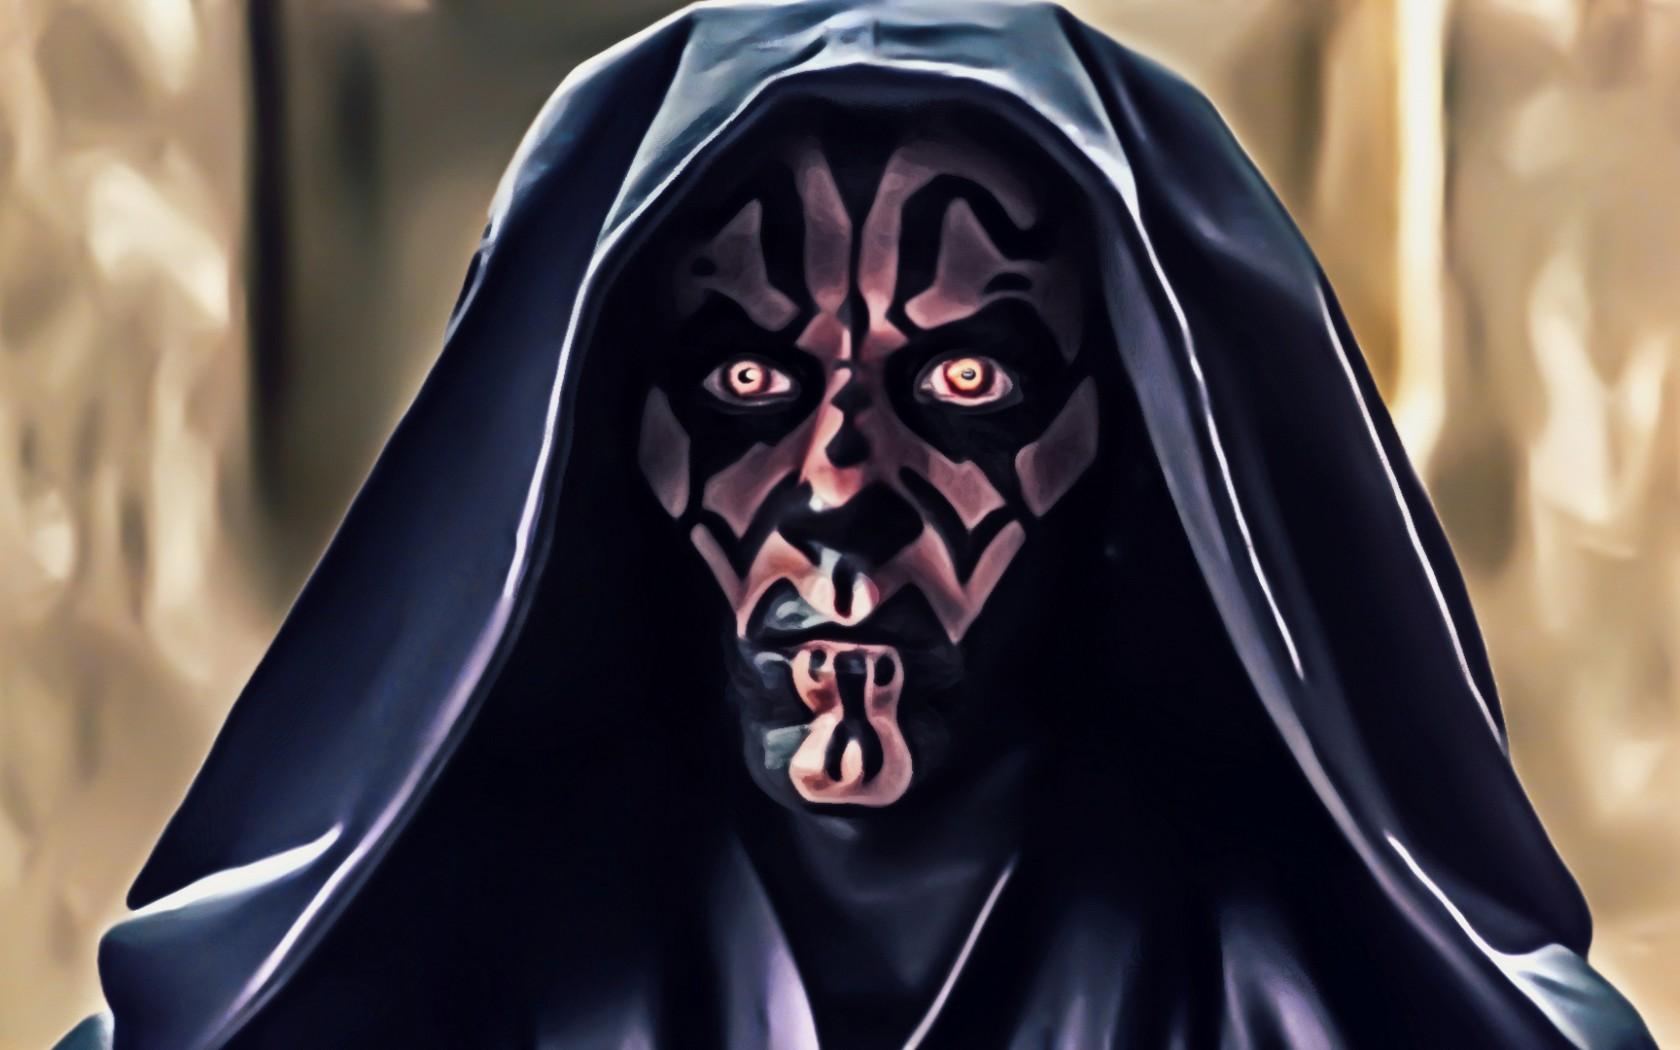 Cool Wallpaper Halloween Star Wars - face-Star-Wars-anime-death-Darth-Maul-ART-costume-561083  You Should Have_28643.jpg